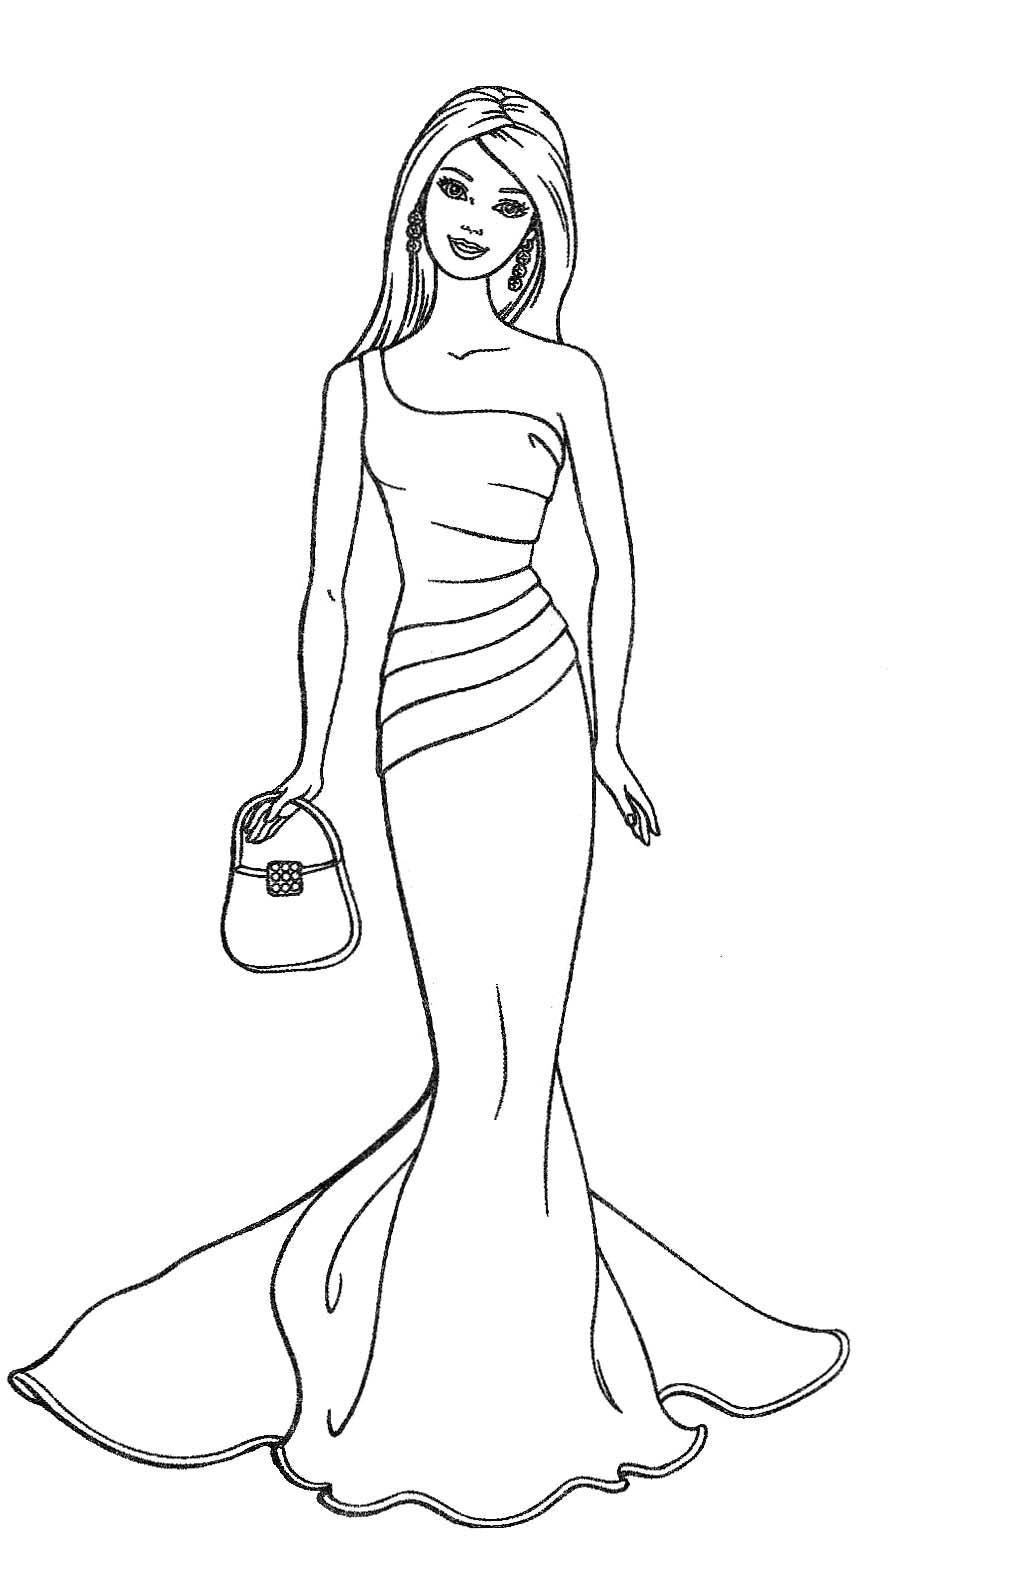 1011x1589 Sketch Of Barbie Dolls